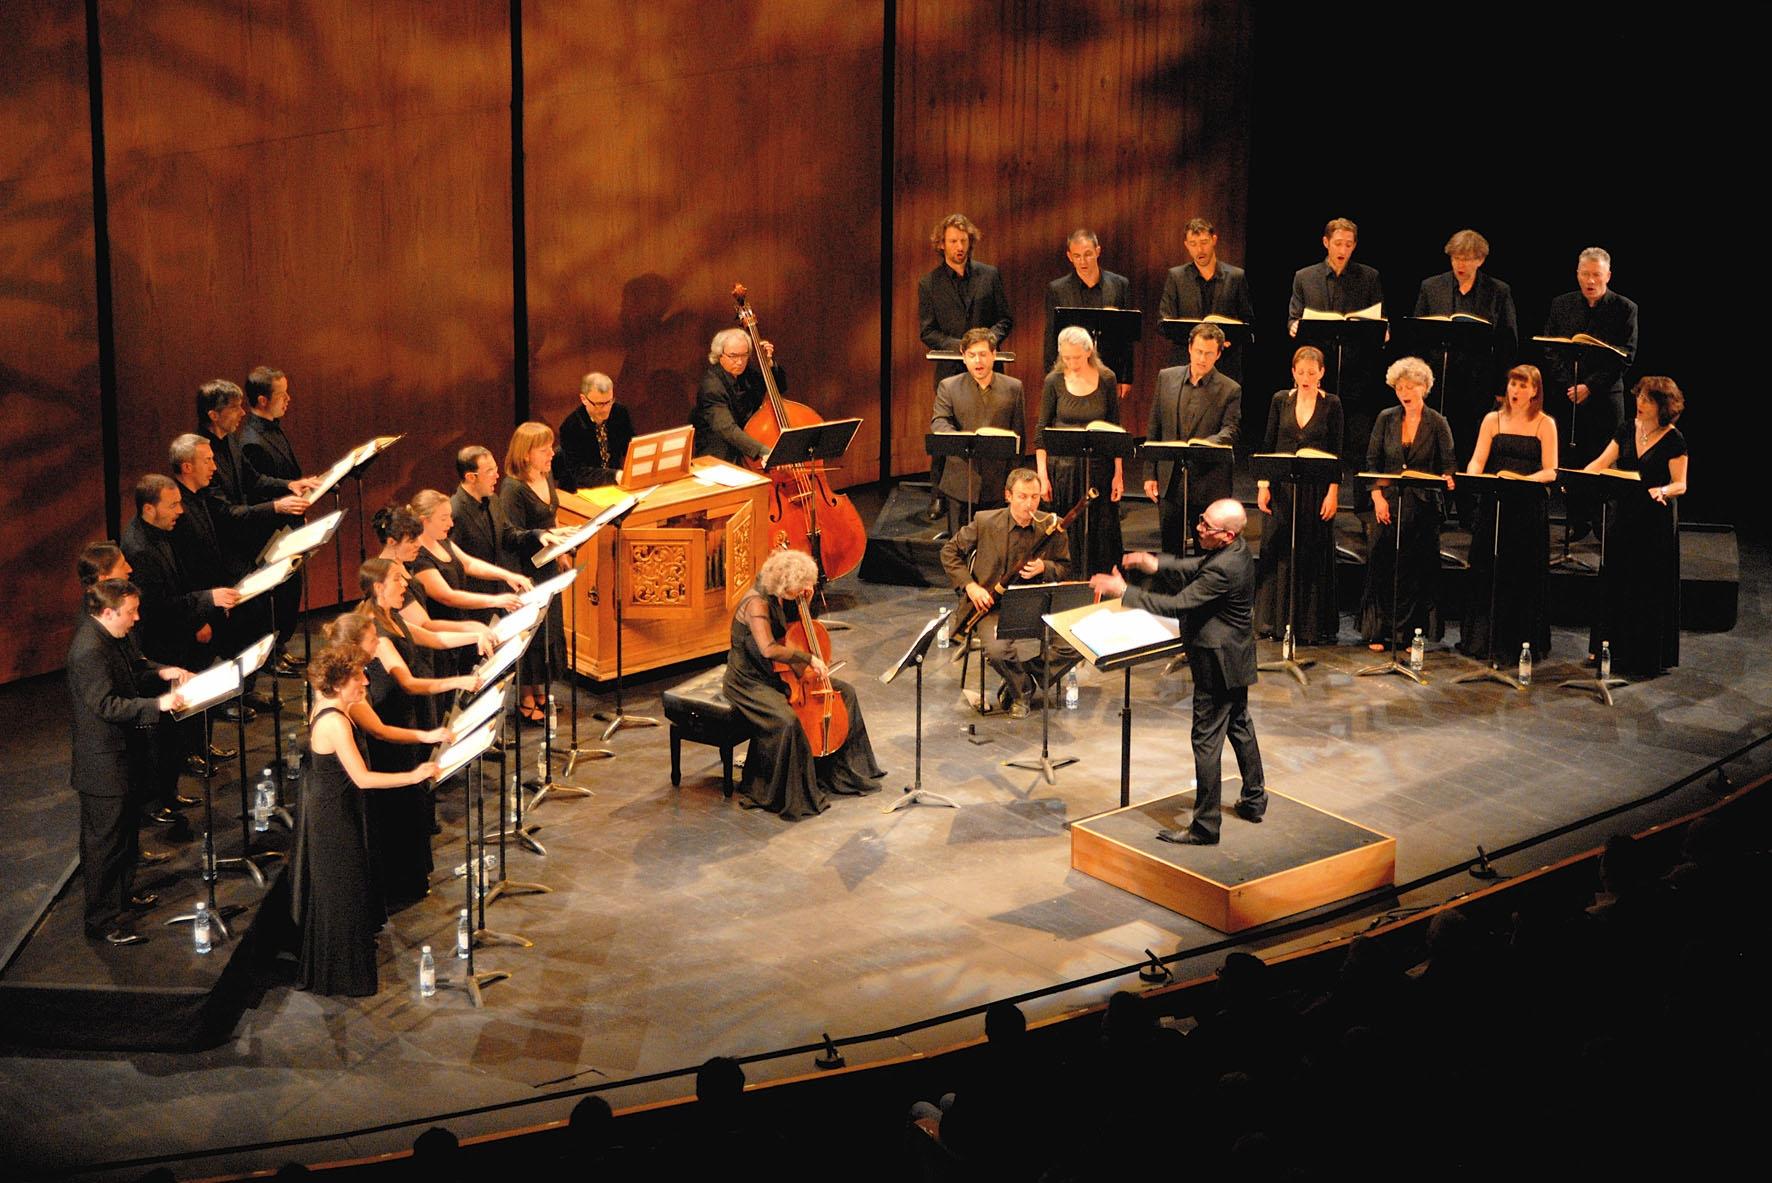 Ensemble Jacques Moderne